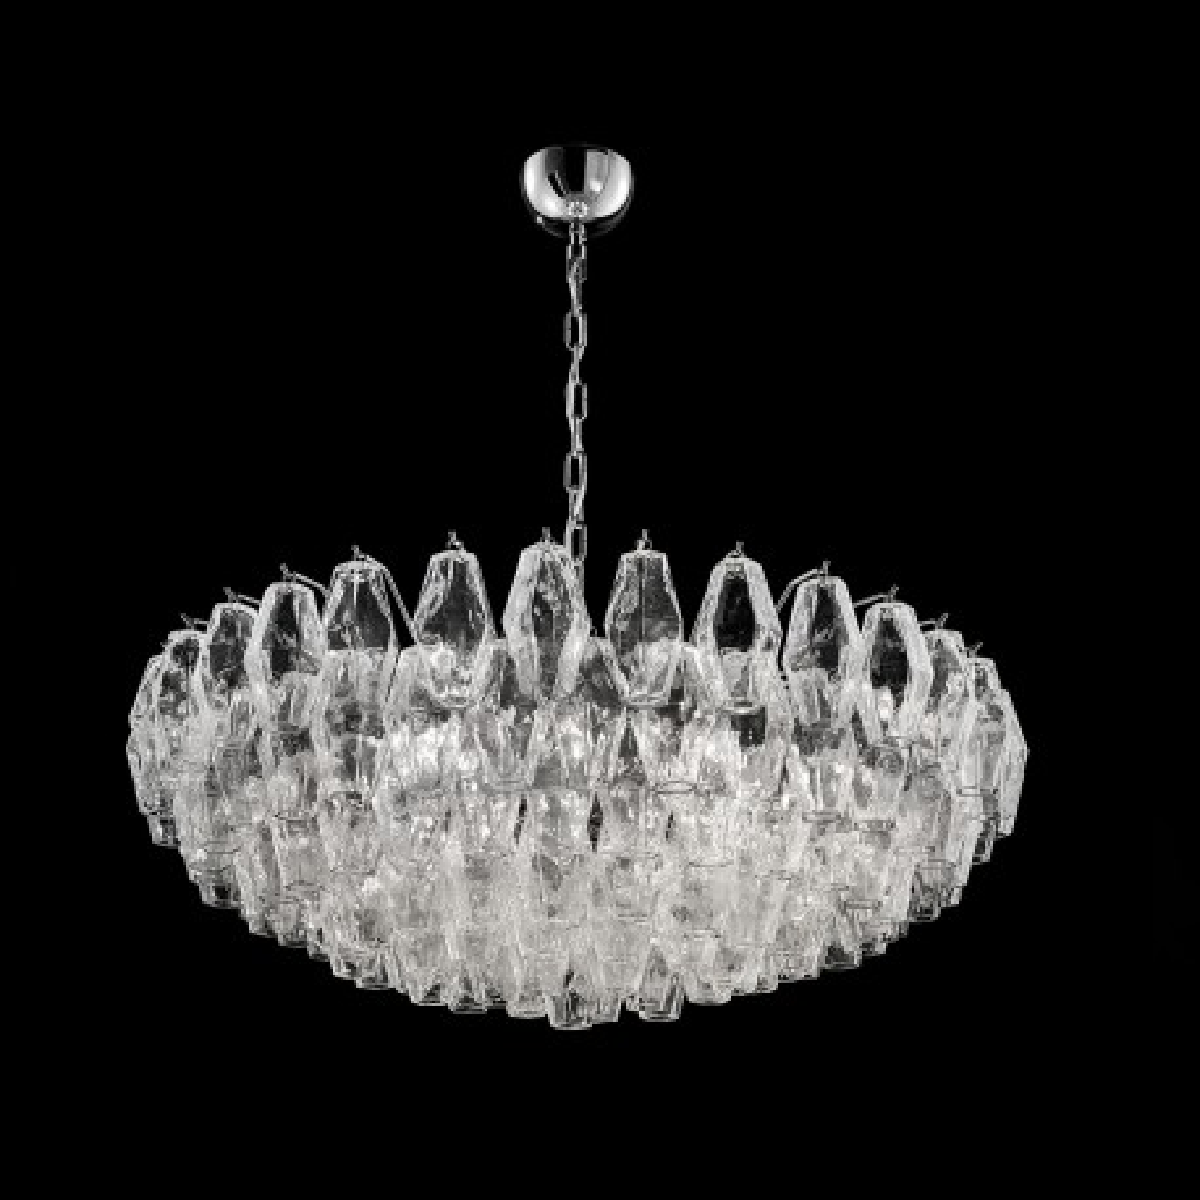 """Henrietta"" Murano glass chandelier - 9 lights - transparent and chrome"